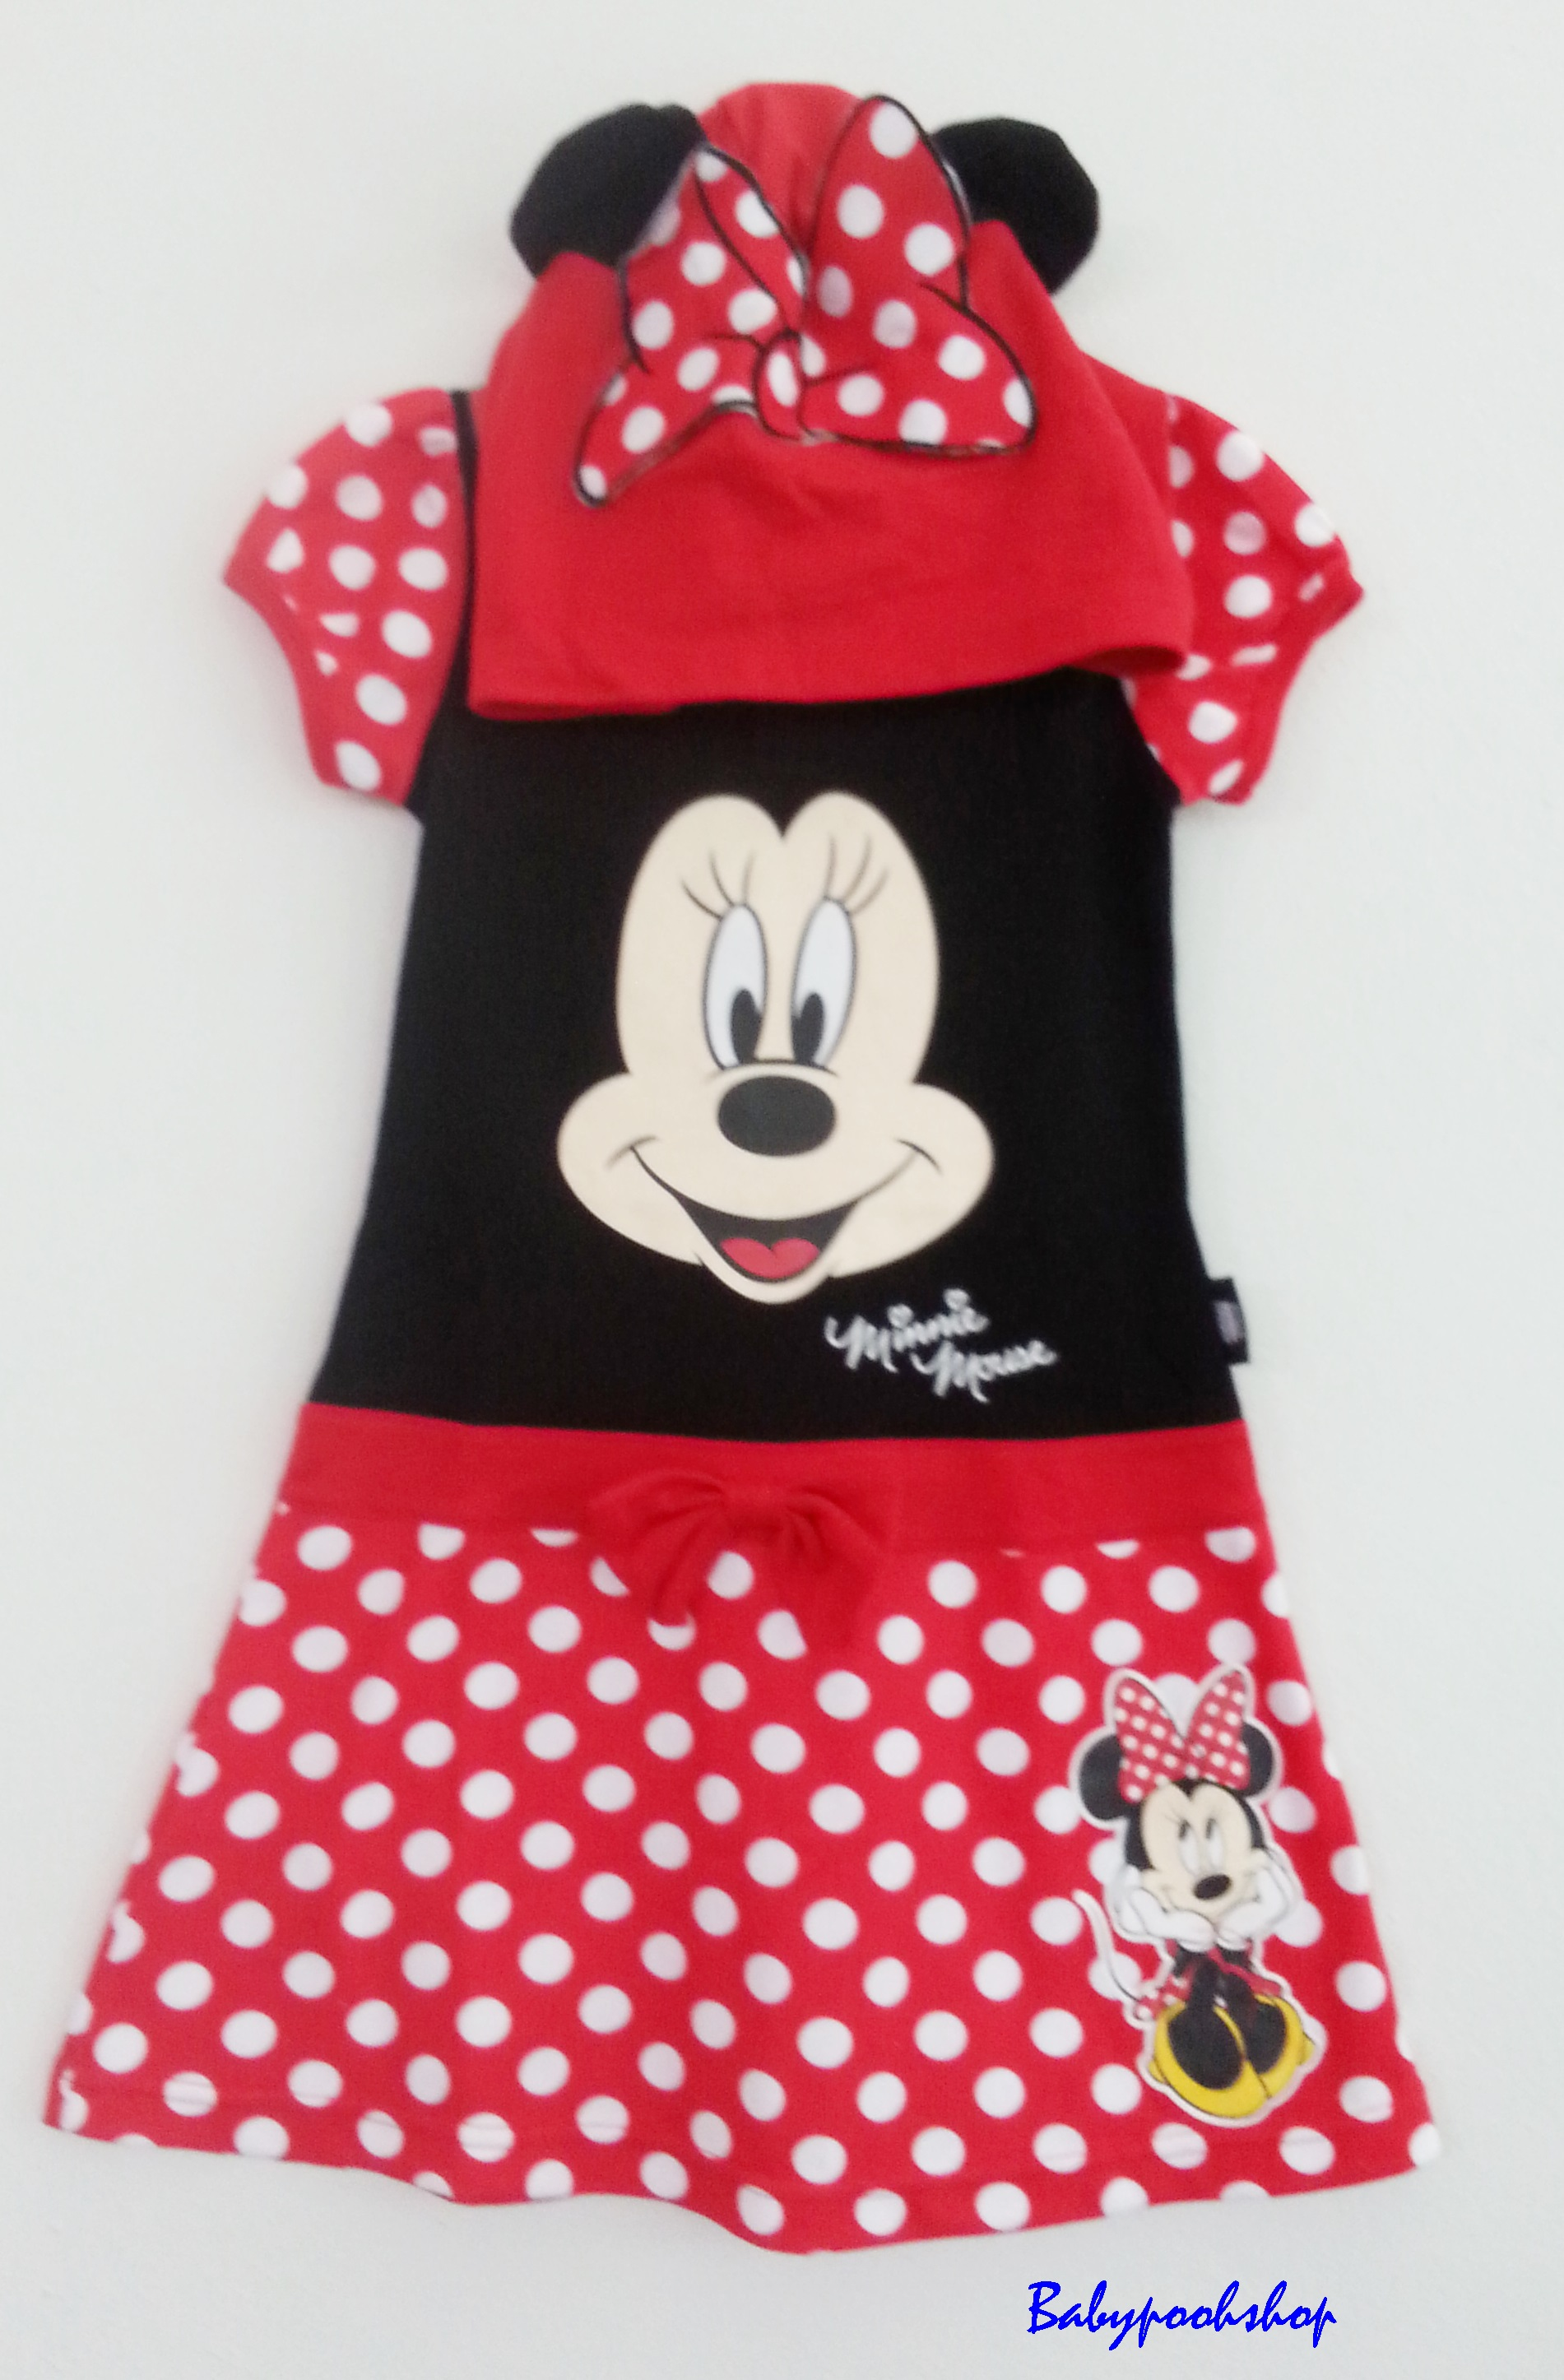 Disney : เดรสมินนี่สีแดงลายจุด มีฮูด size S (2-3y)